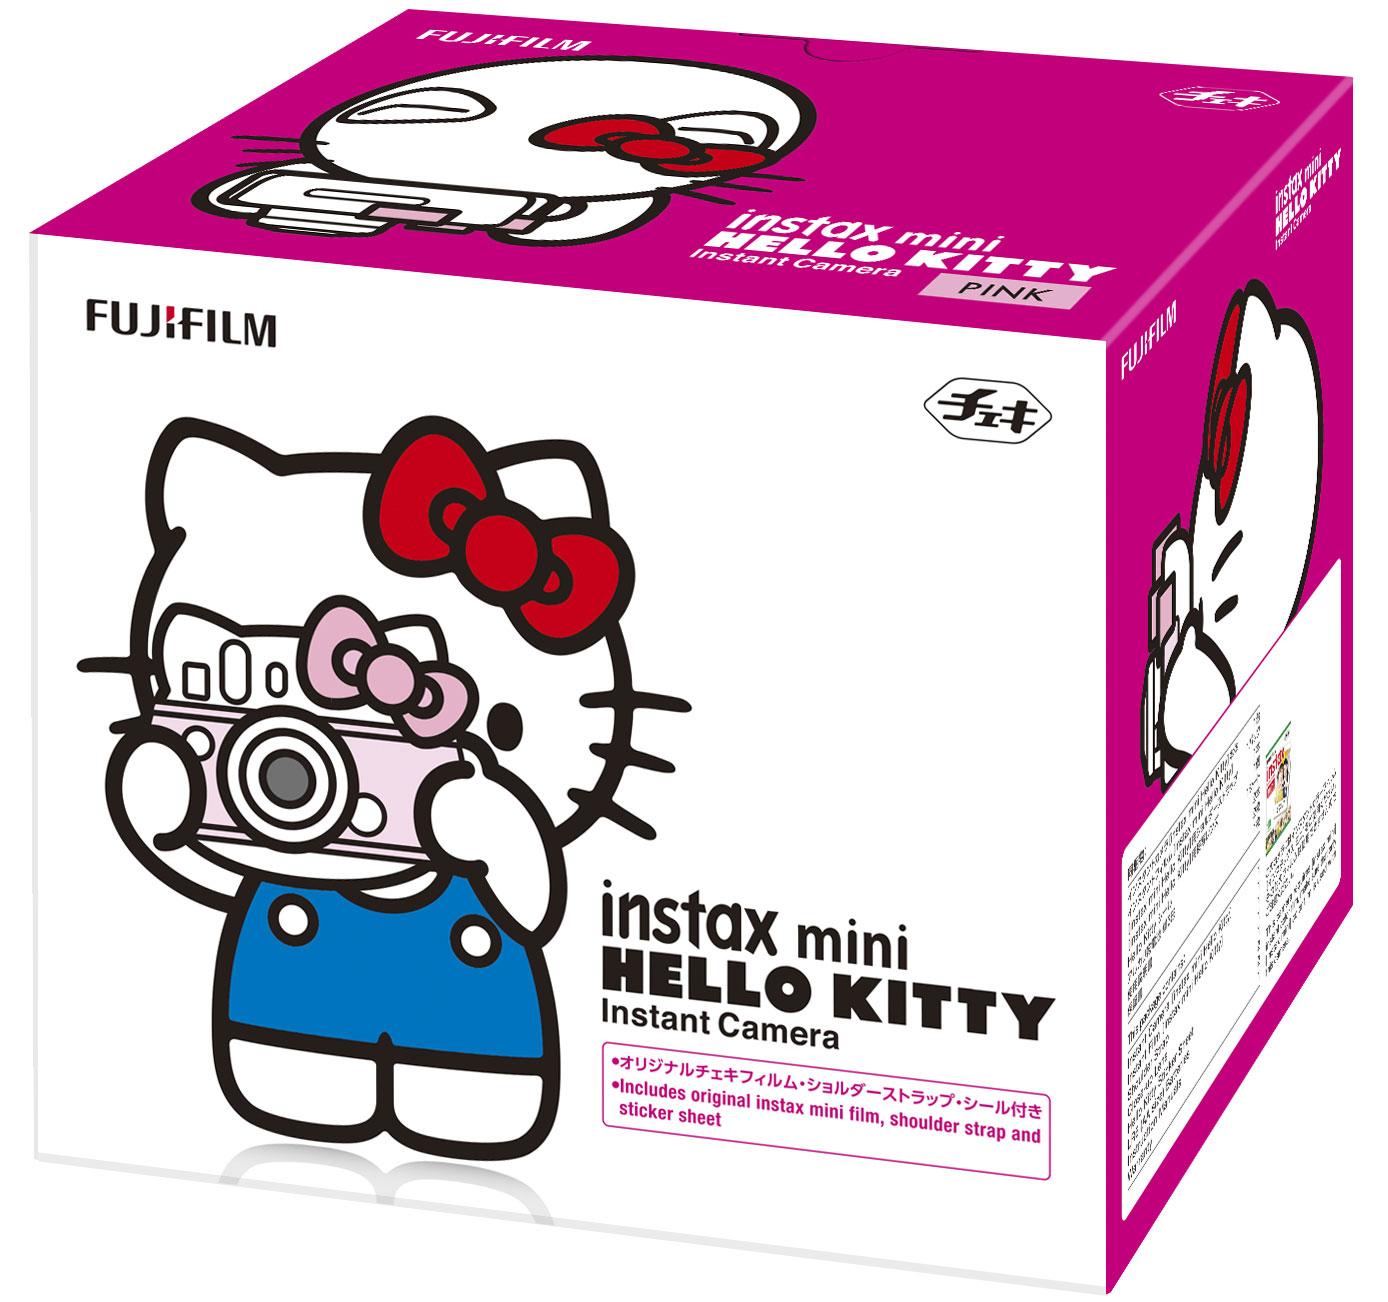 Fujifilm Instax Mini Hello Kitty, Pink фотоаппарат моментальной печати